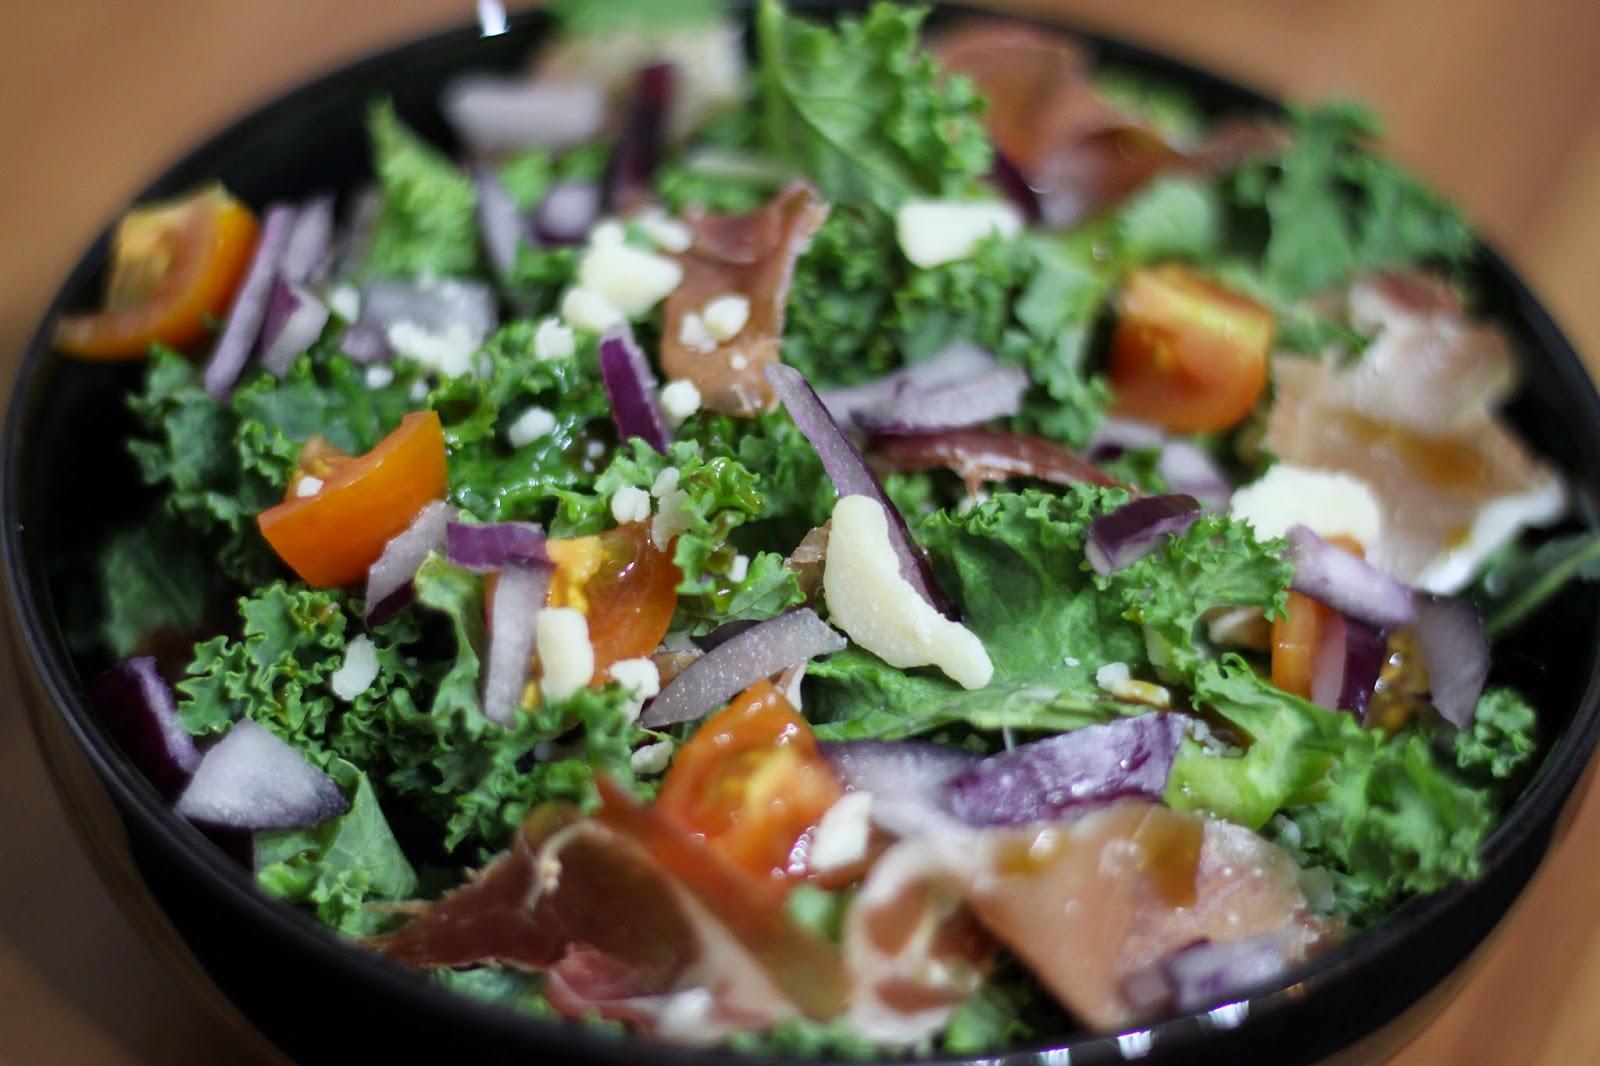 kale salad recipe - parmesan, parma, tomato, onion, olives and balsamic vinegar